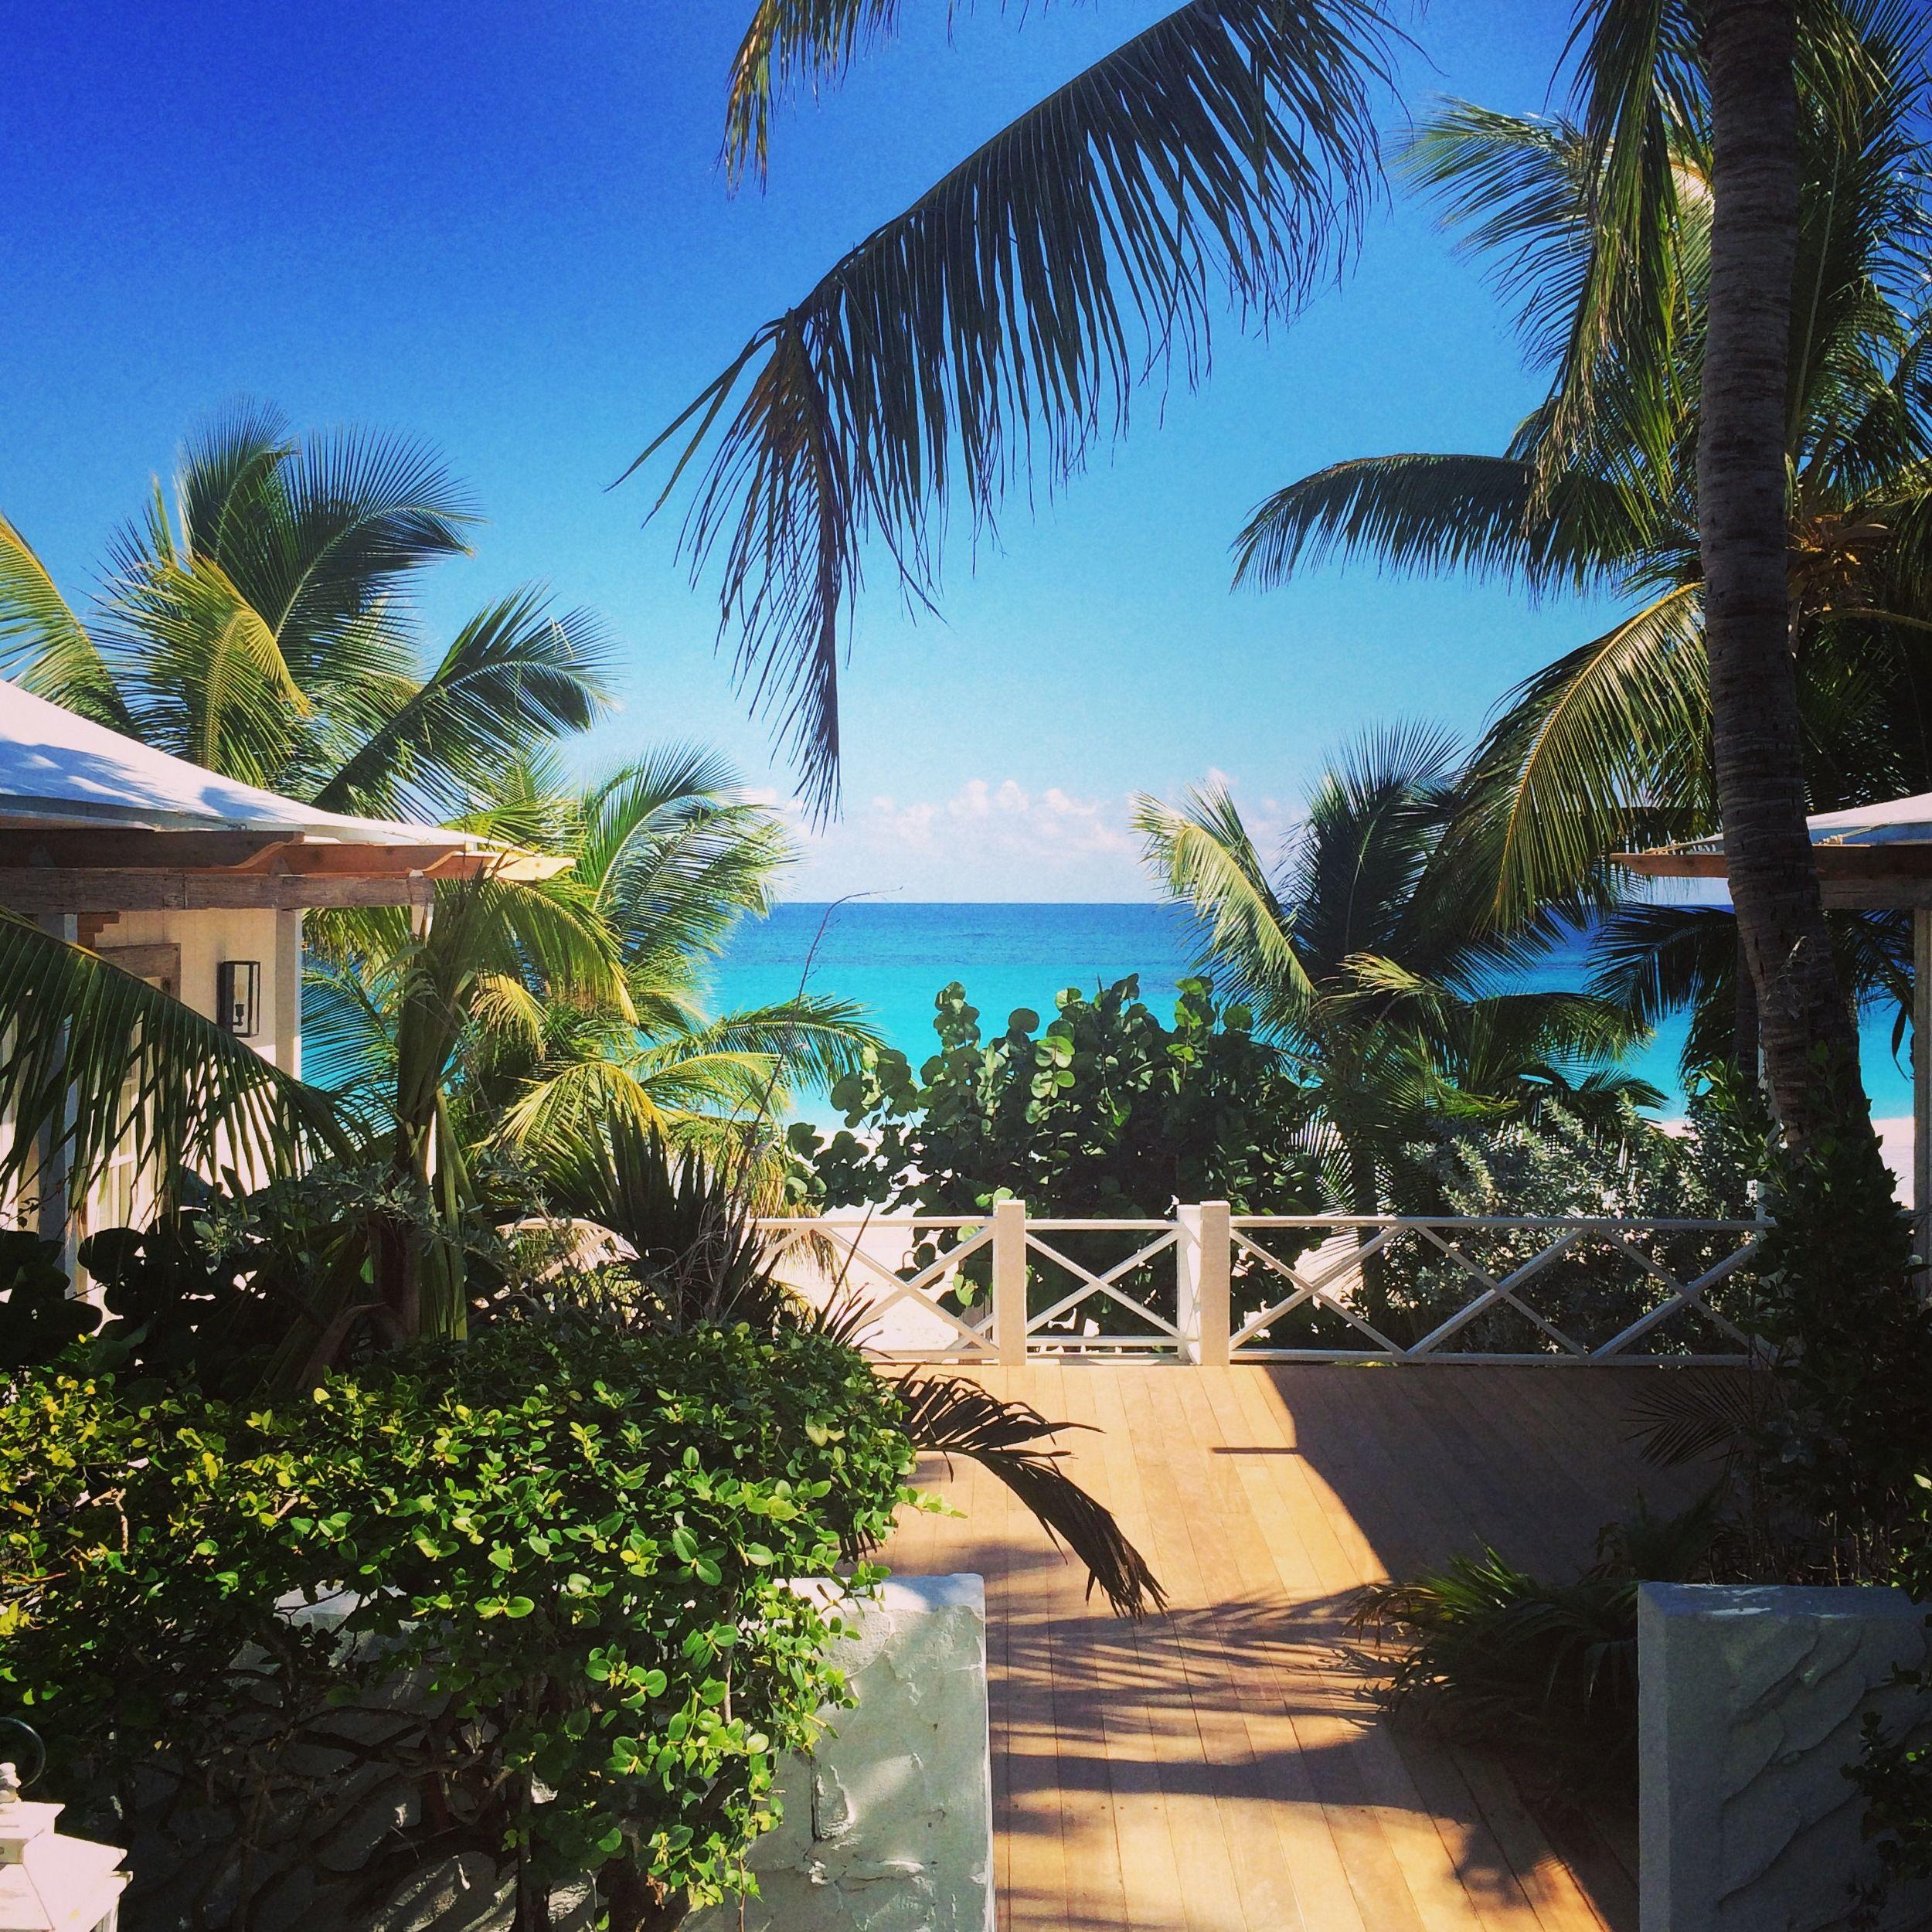 Ocean View Club Harbor Island Eluthera Bahamas